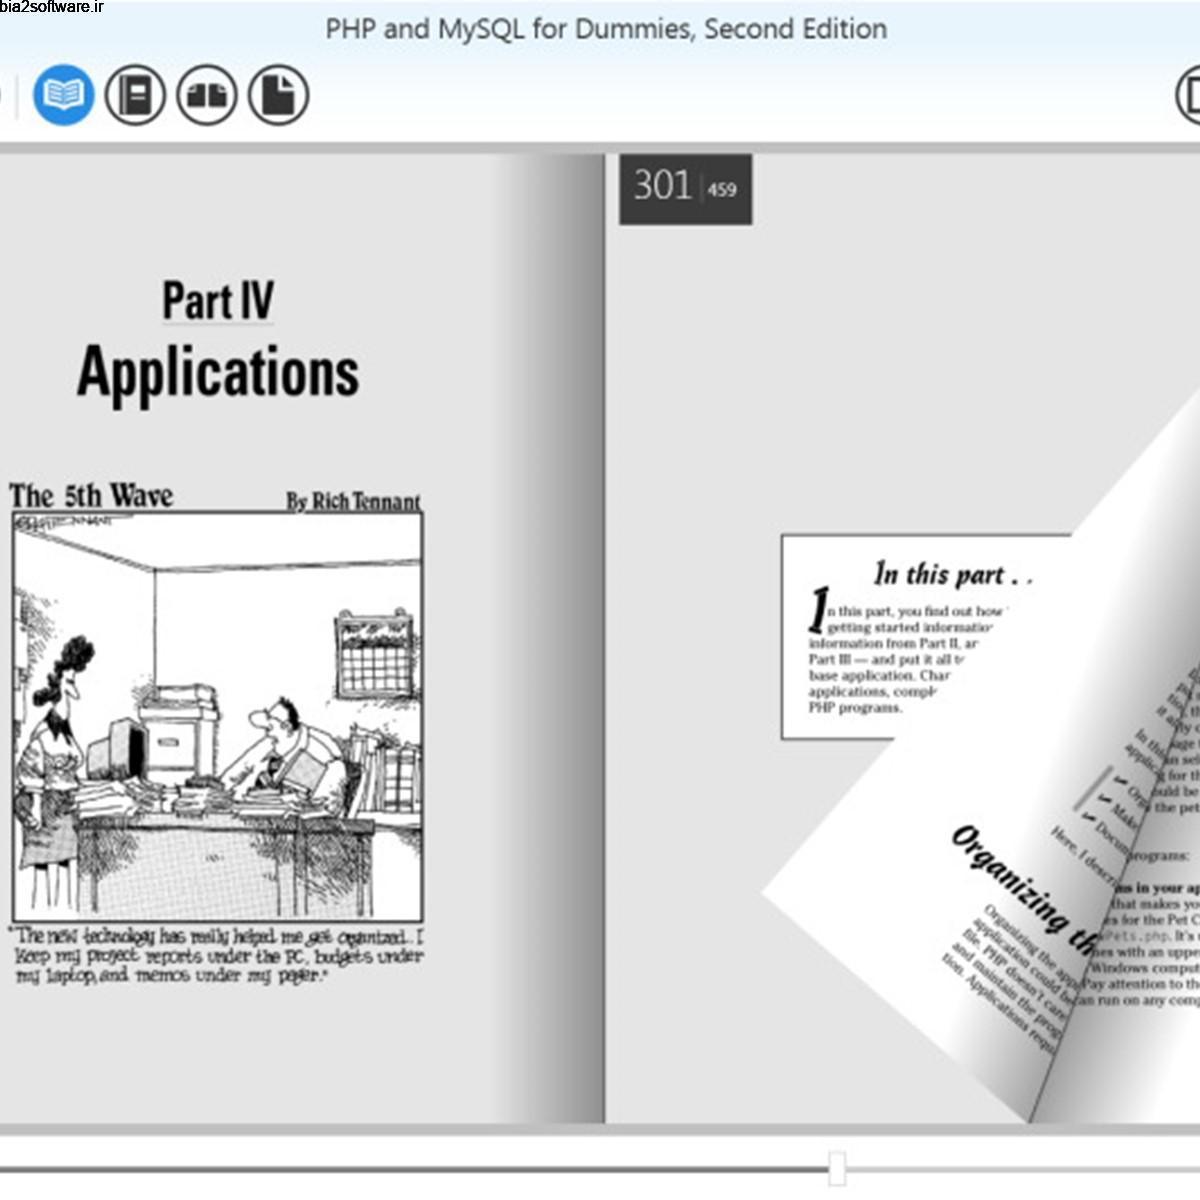 AlfaReader 3.7.2.1 خواندن کتابهای الکترونیکی برای ویندوز